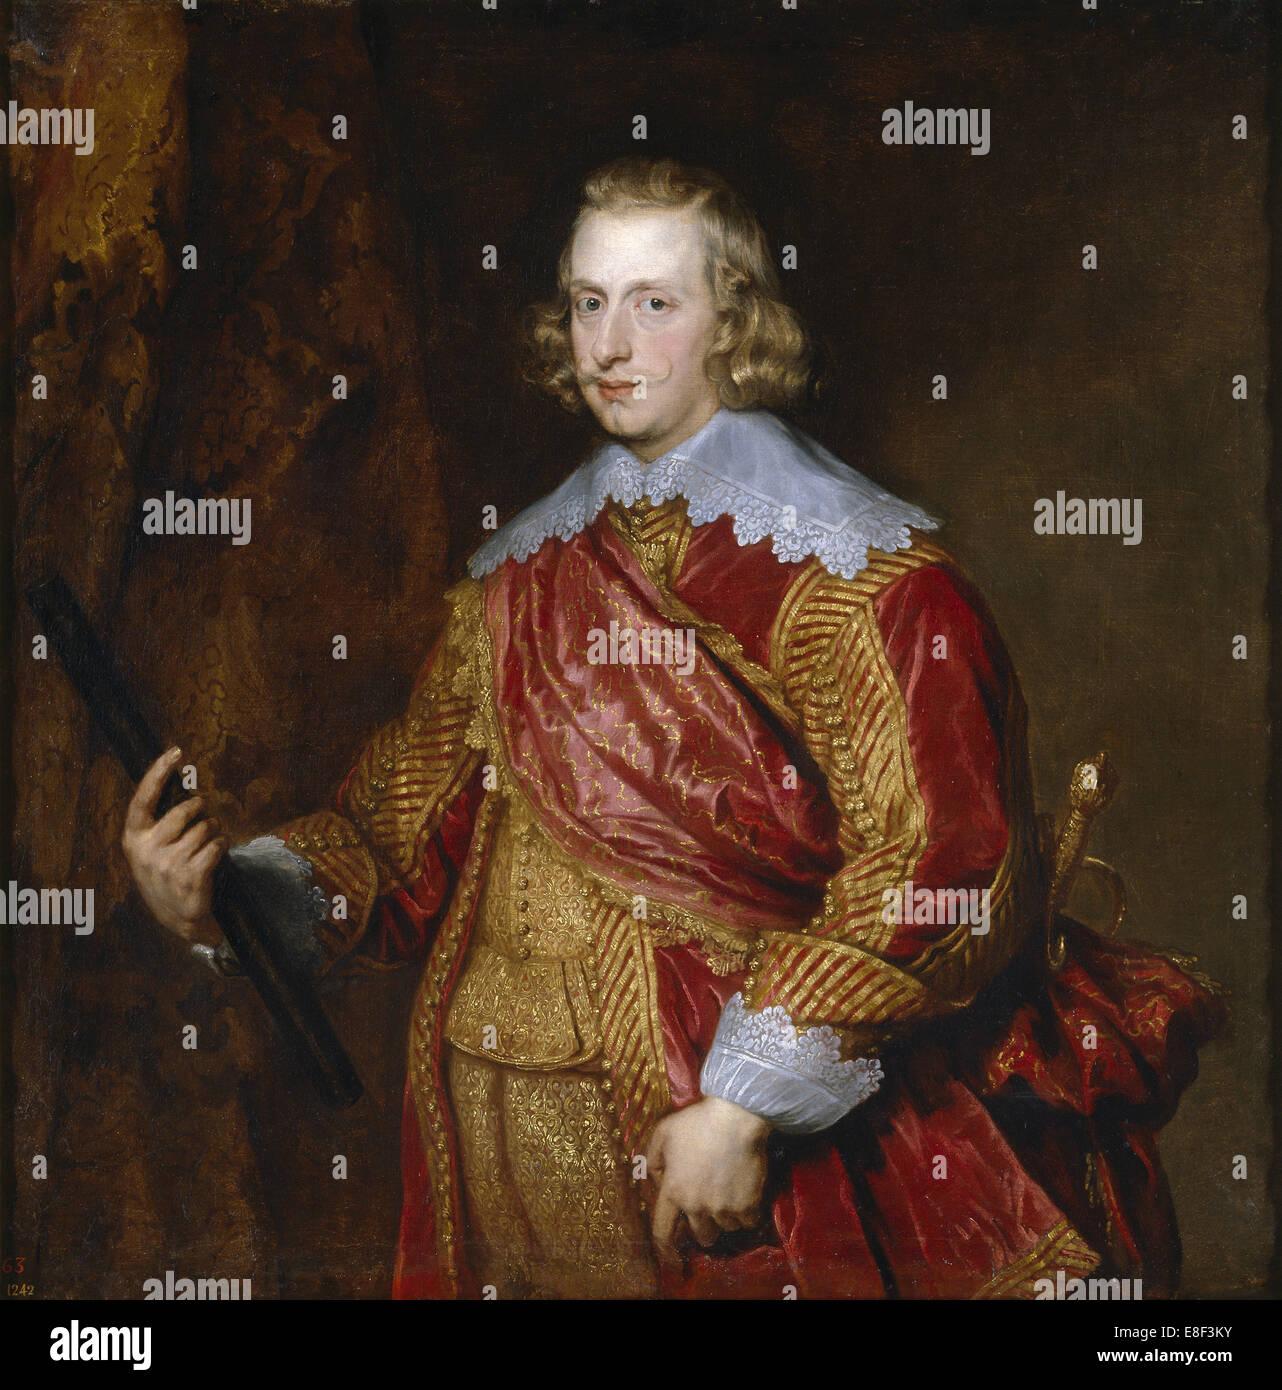 Portrait of Cardinal-Infante Ferdinand of Austria. Artist: Dyck, Sir Anthony van (1599-1641) - Stock Image